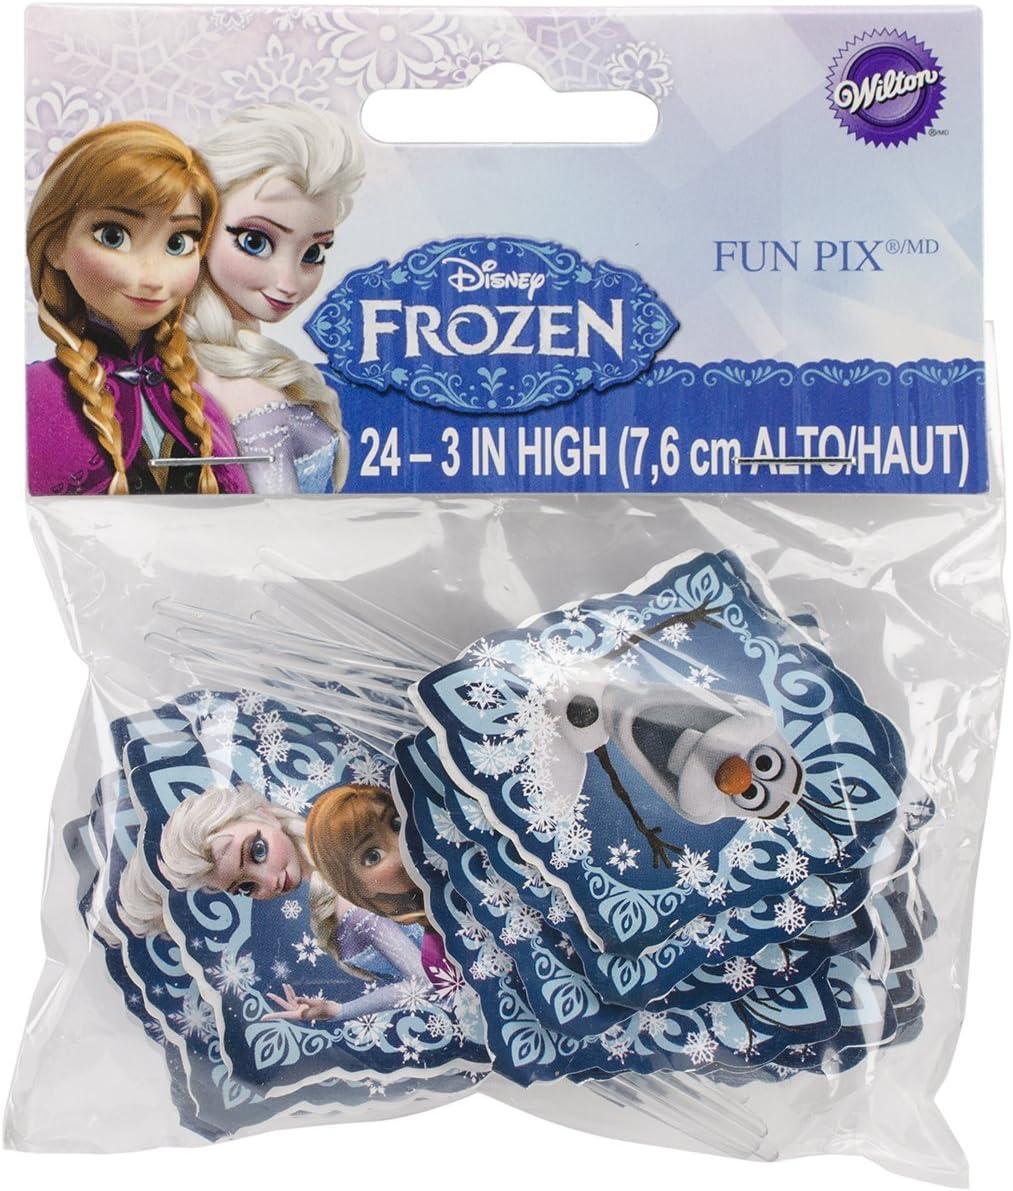 Wilton 2113-4500 Disney Frozen Fun Pix Cupcake Decor